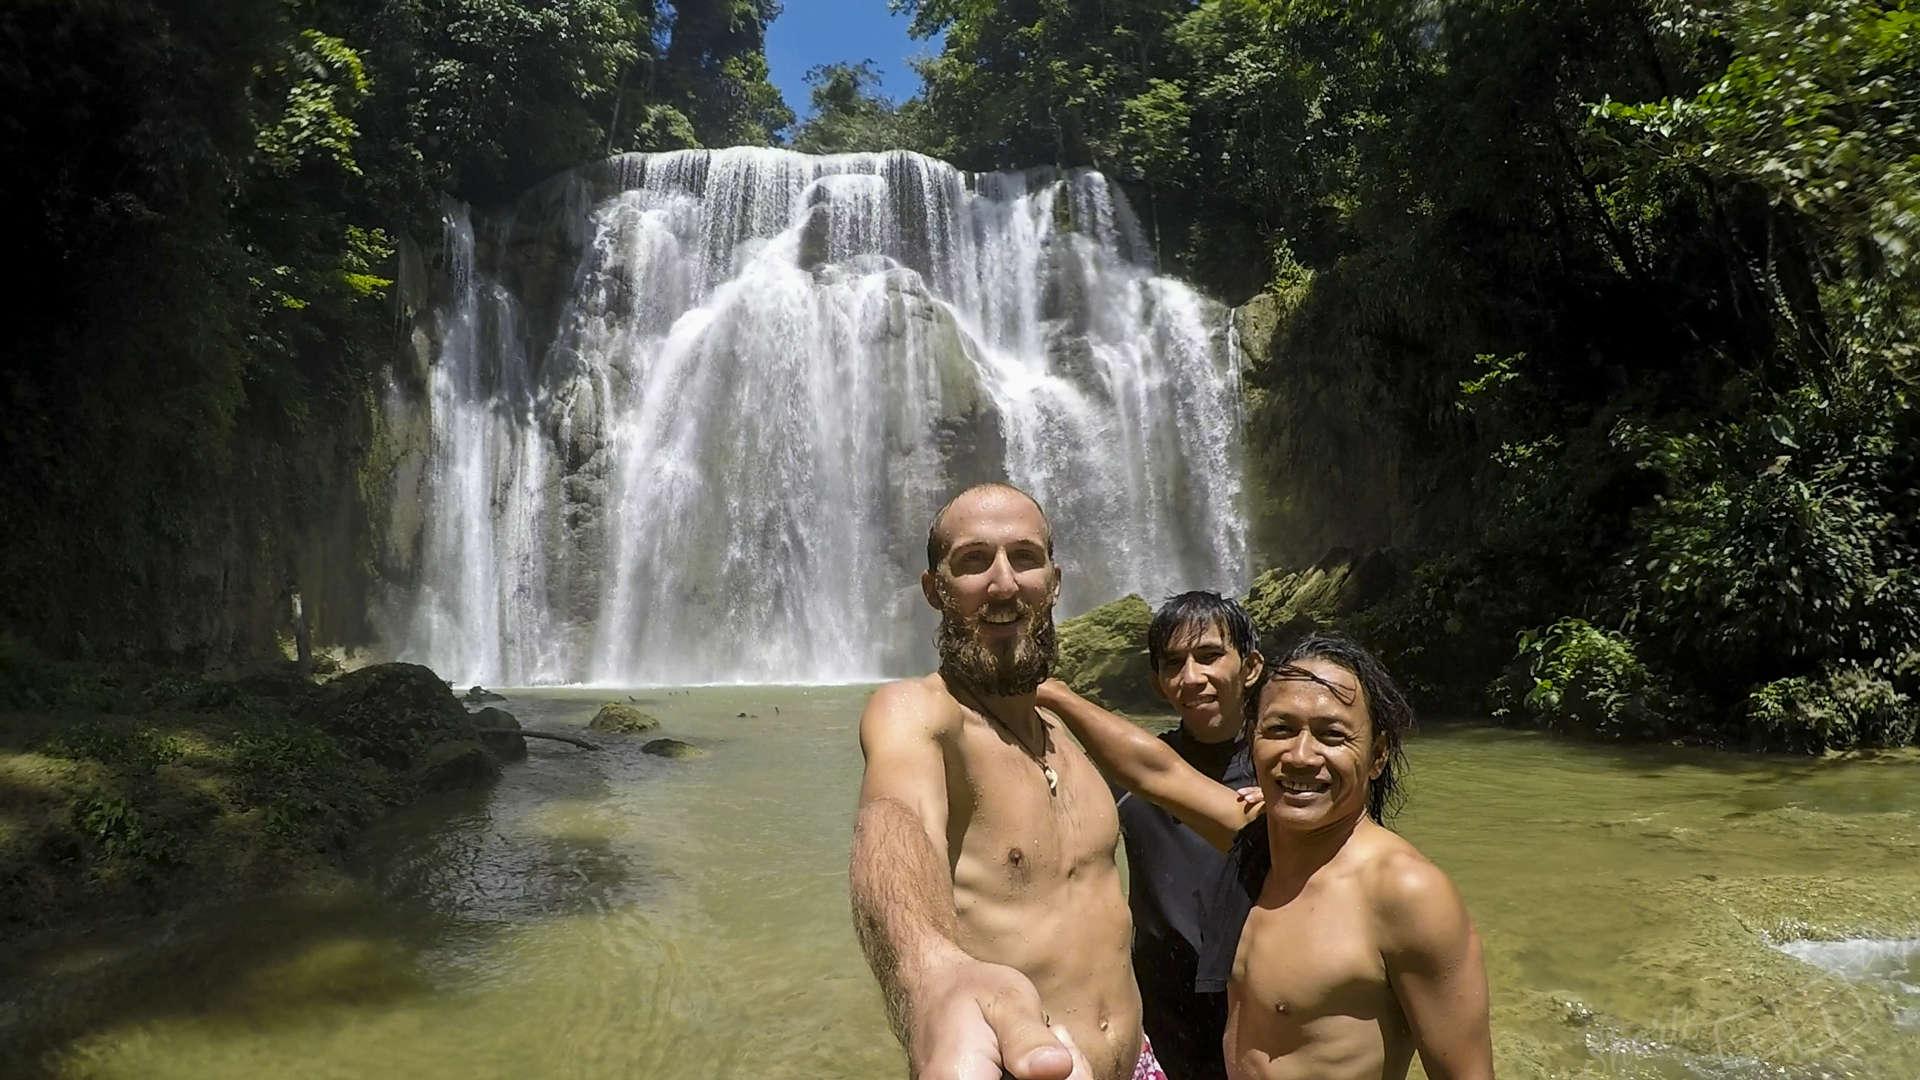 watefall jungle, waterfall bau-bau, waterfall sulawesi, waterfall indonesia, waterfall out of beaten path, indonesia waterfall, secret waterfall indonesia